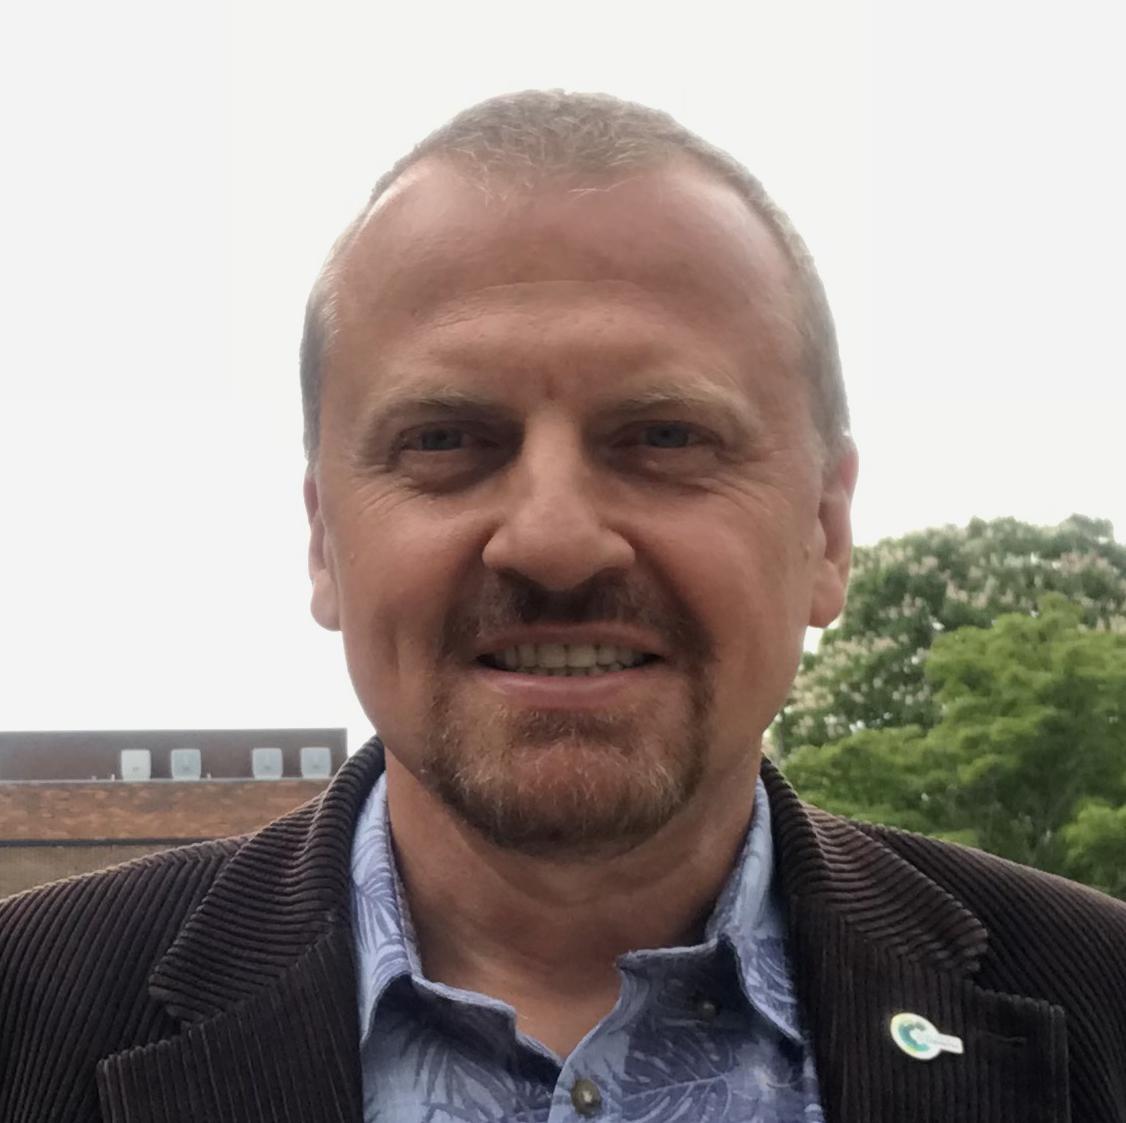 Paunov 11 June 2018